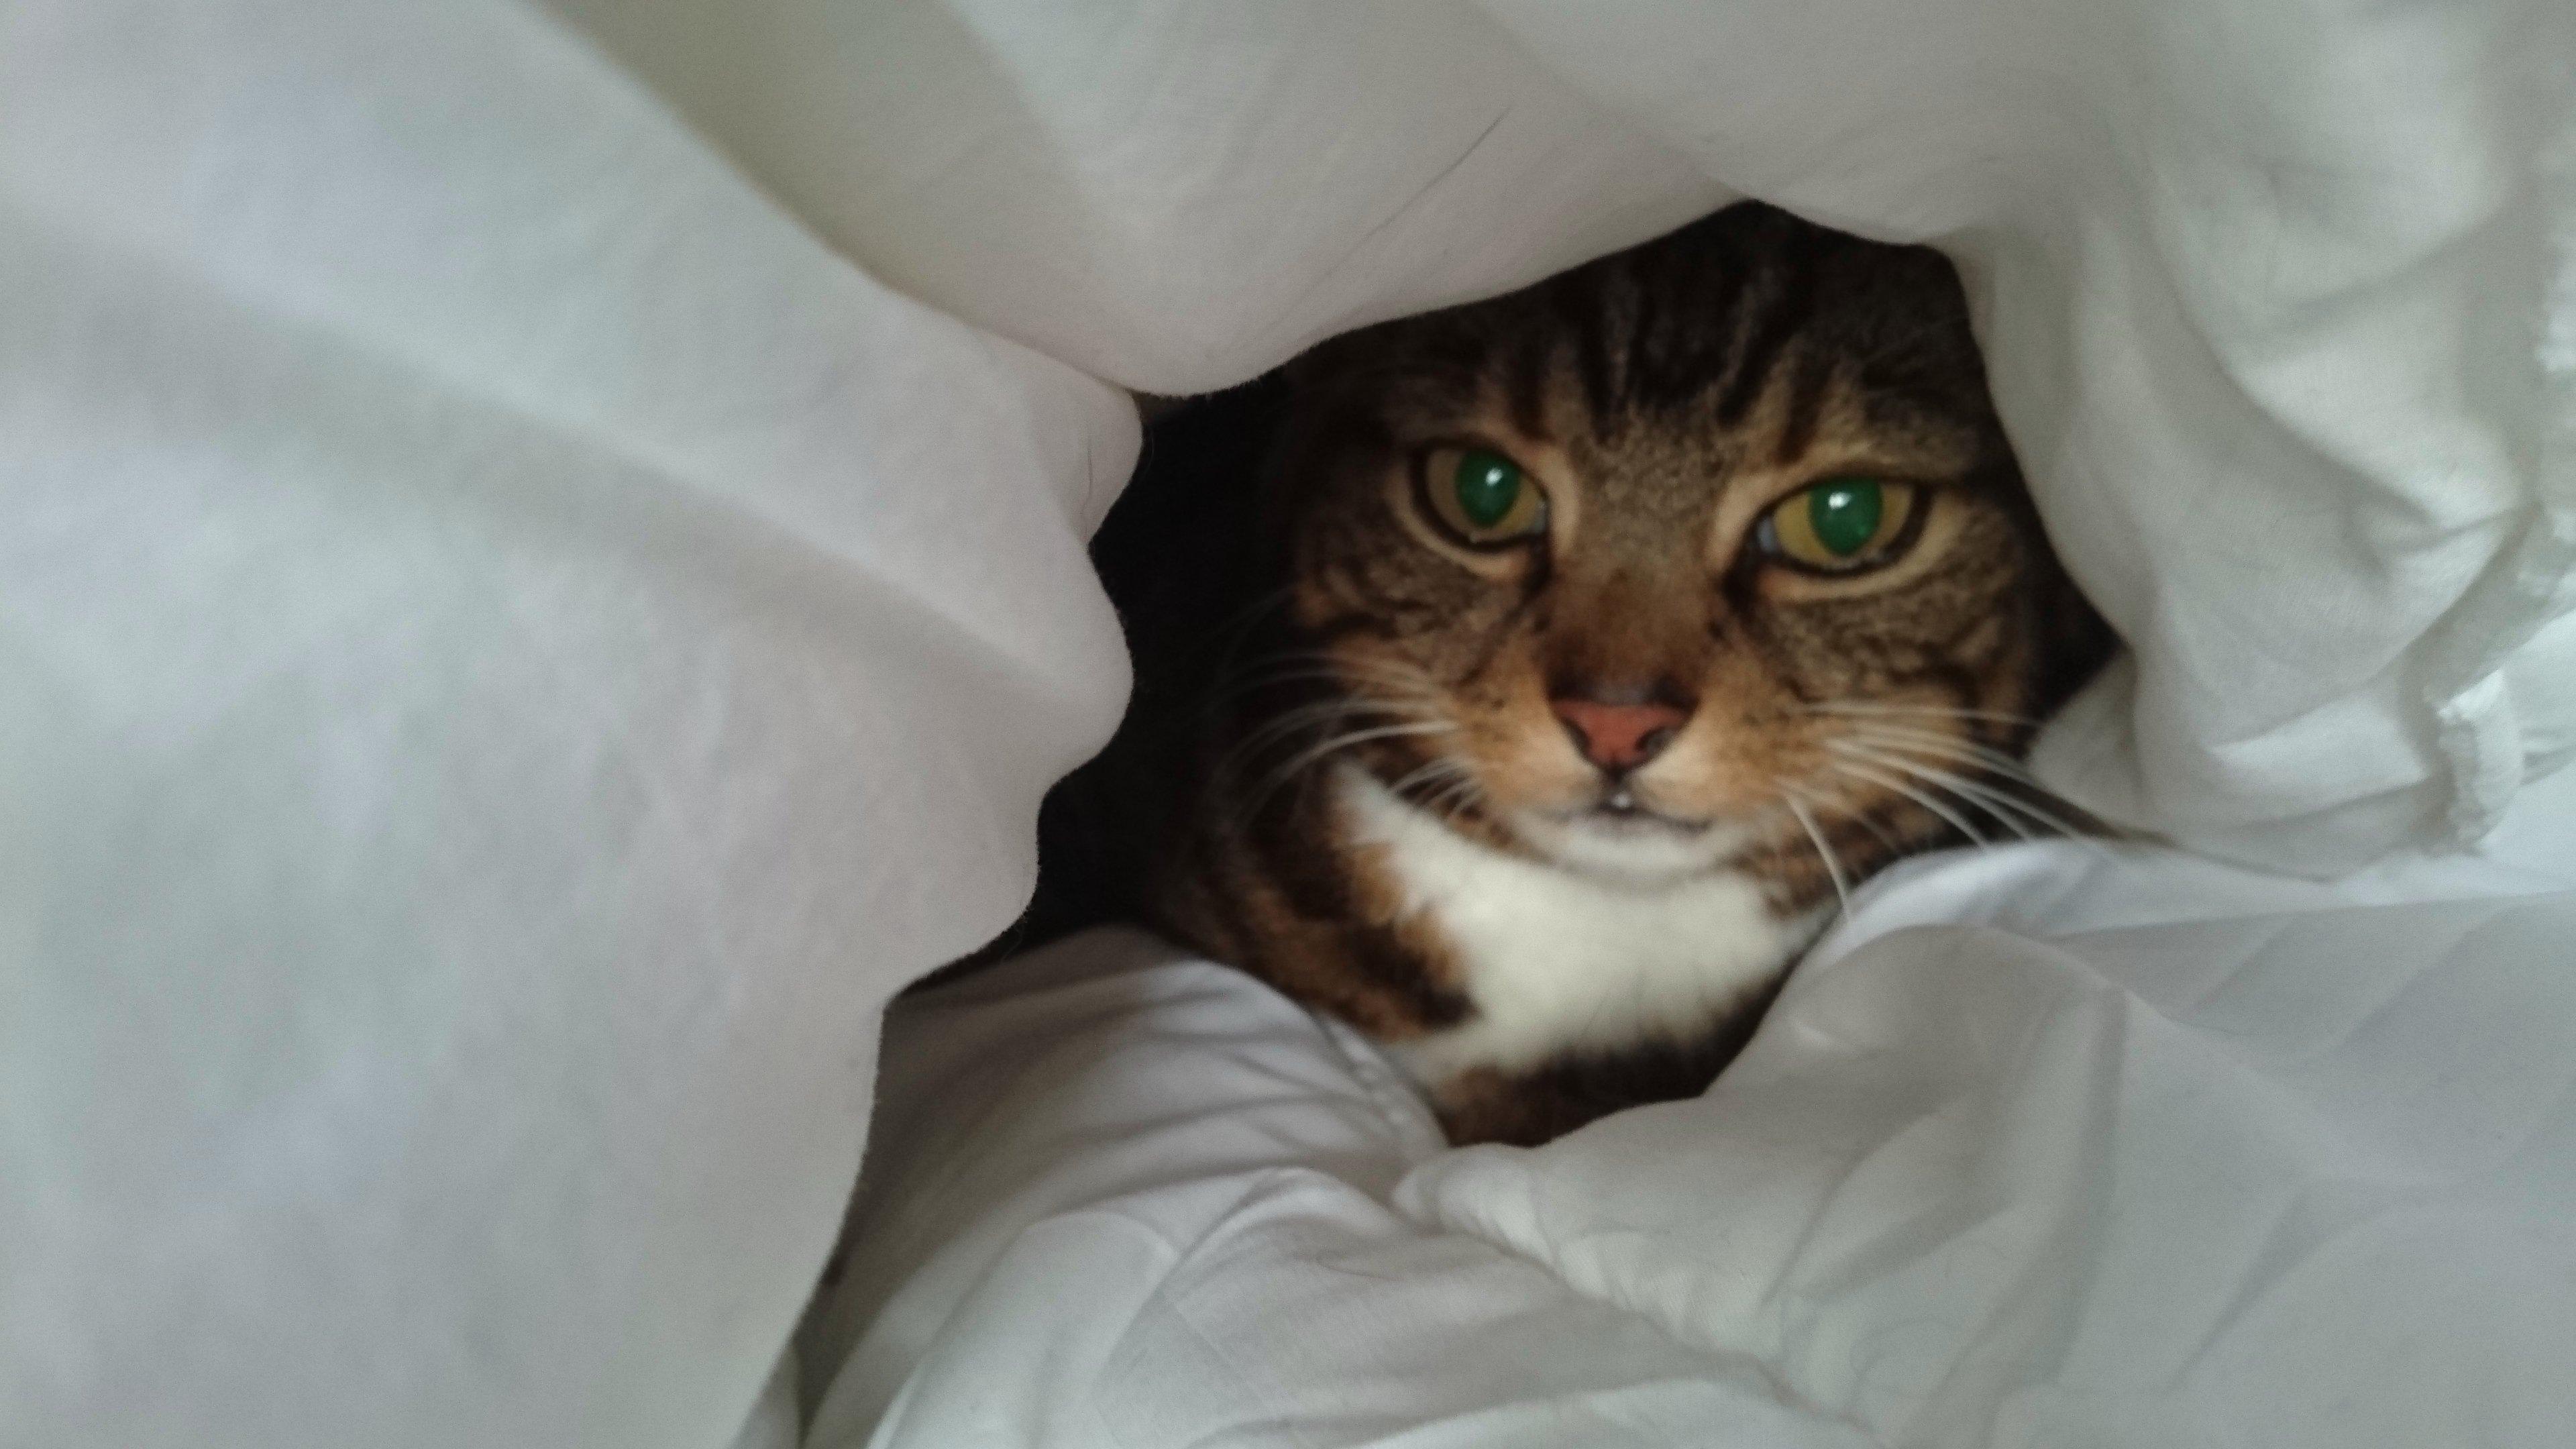 Wallpaper Animal Cat Cats Eye Greeneyes Kitten Katze Gato Paw Sony Tabby Whiskers Xperia Bed Comfy 3840x2160 1123607 Hd Wallpapers Wallhere